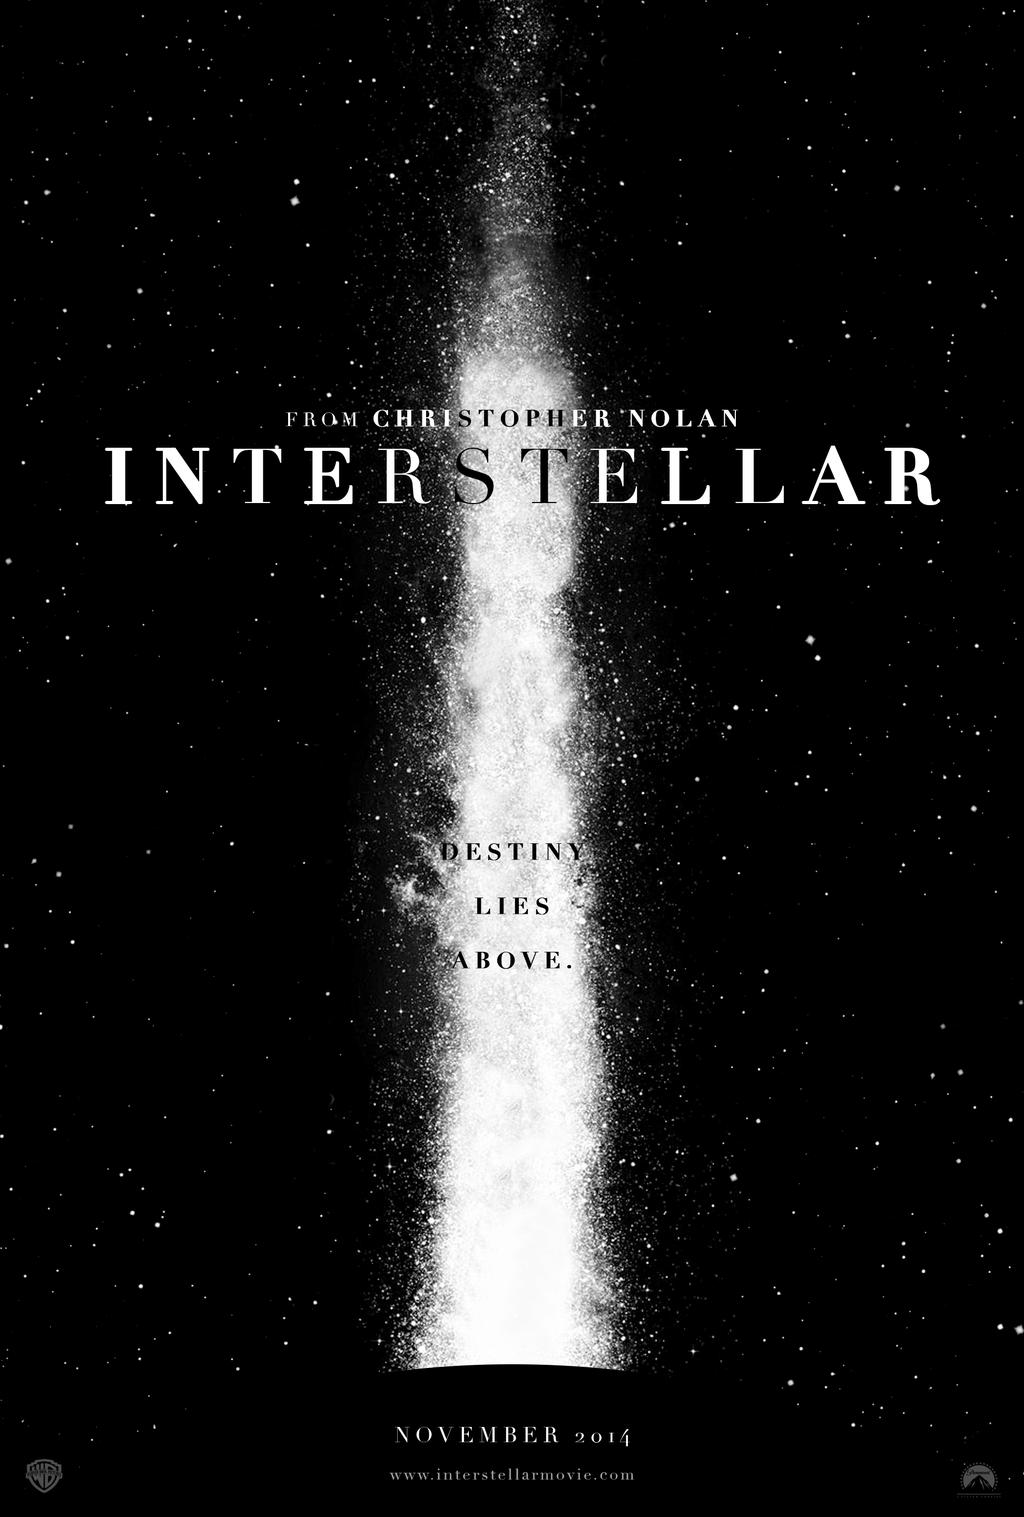 http://2.bp.blogspot.com/-SbSMAba7e2Q/U3ZQLPVdKxI/AAAAAAAANhA/1VQM8jSbED8/s1600/interstellar_fan_poster_by_henrychastain-d6xqzdf.png